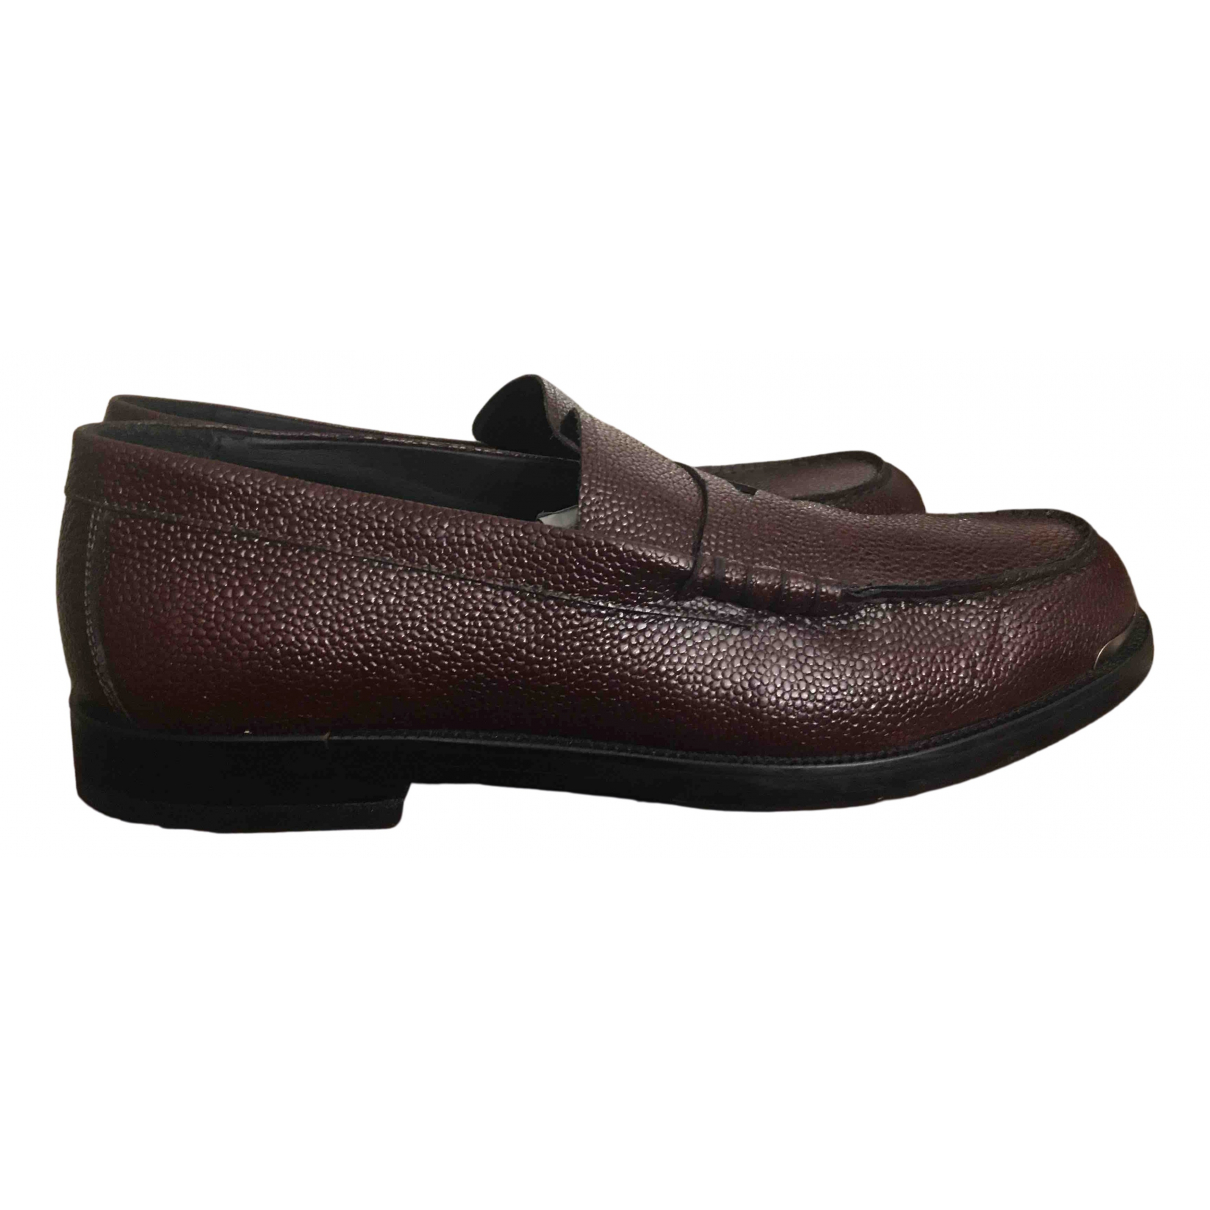 Emporio Armani - Derbies   pour homme en cuir - marron